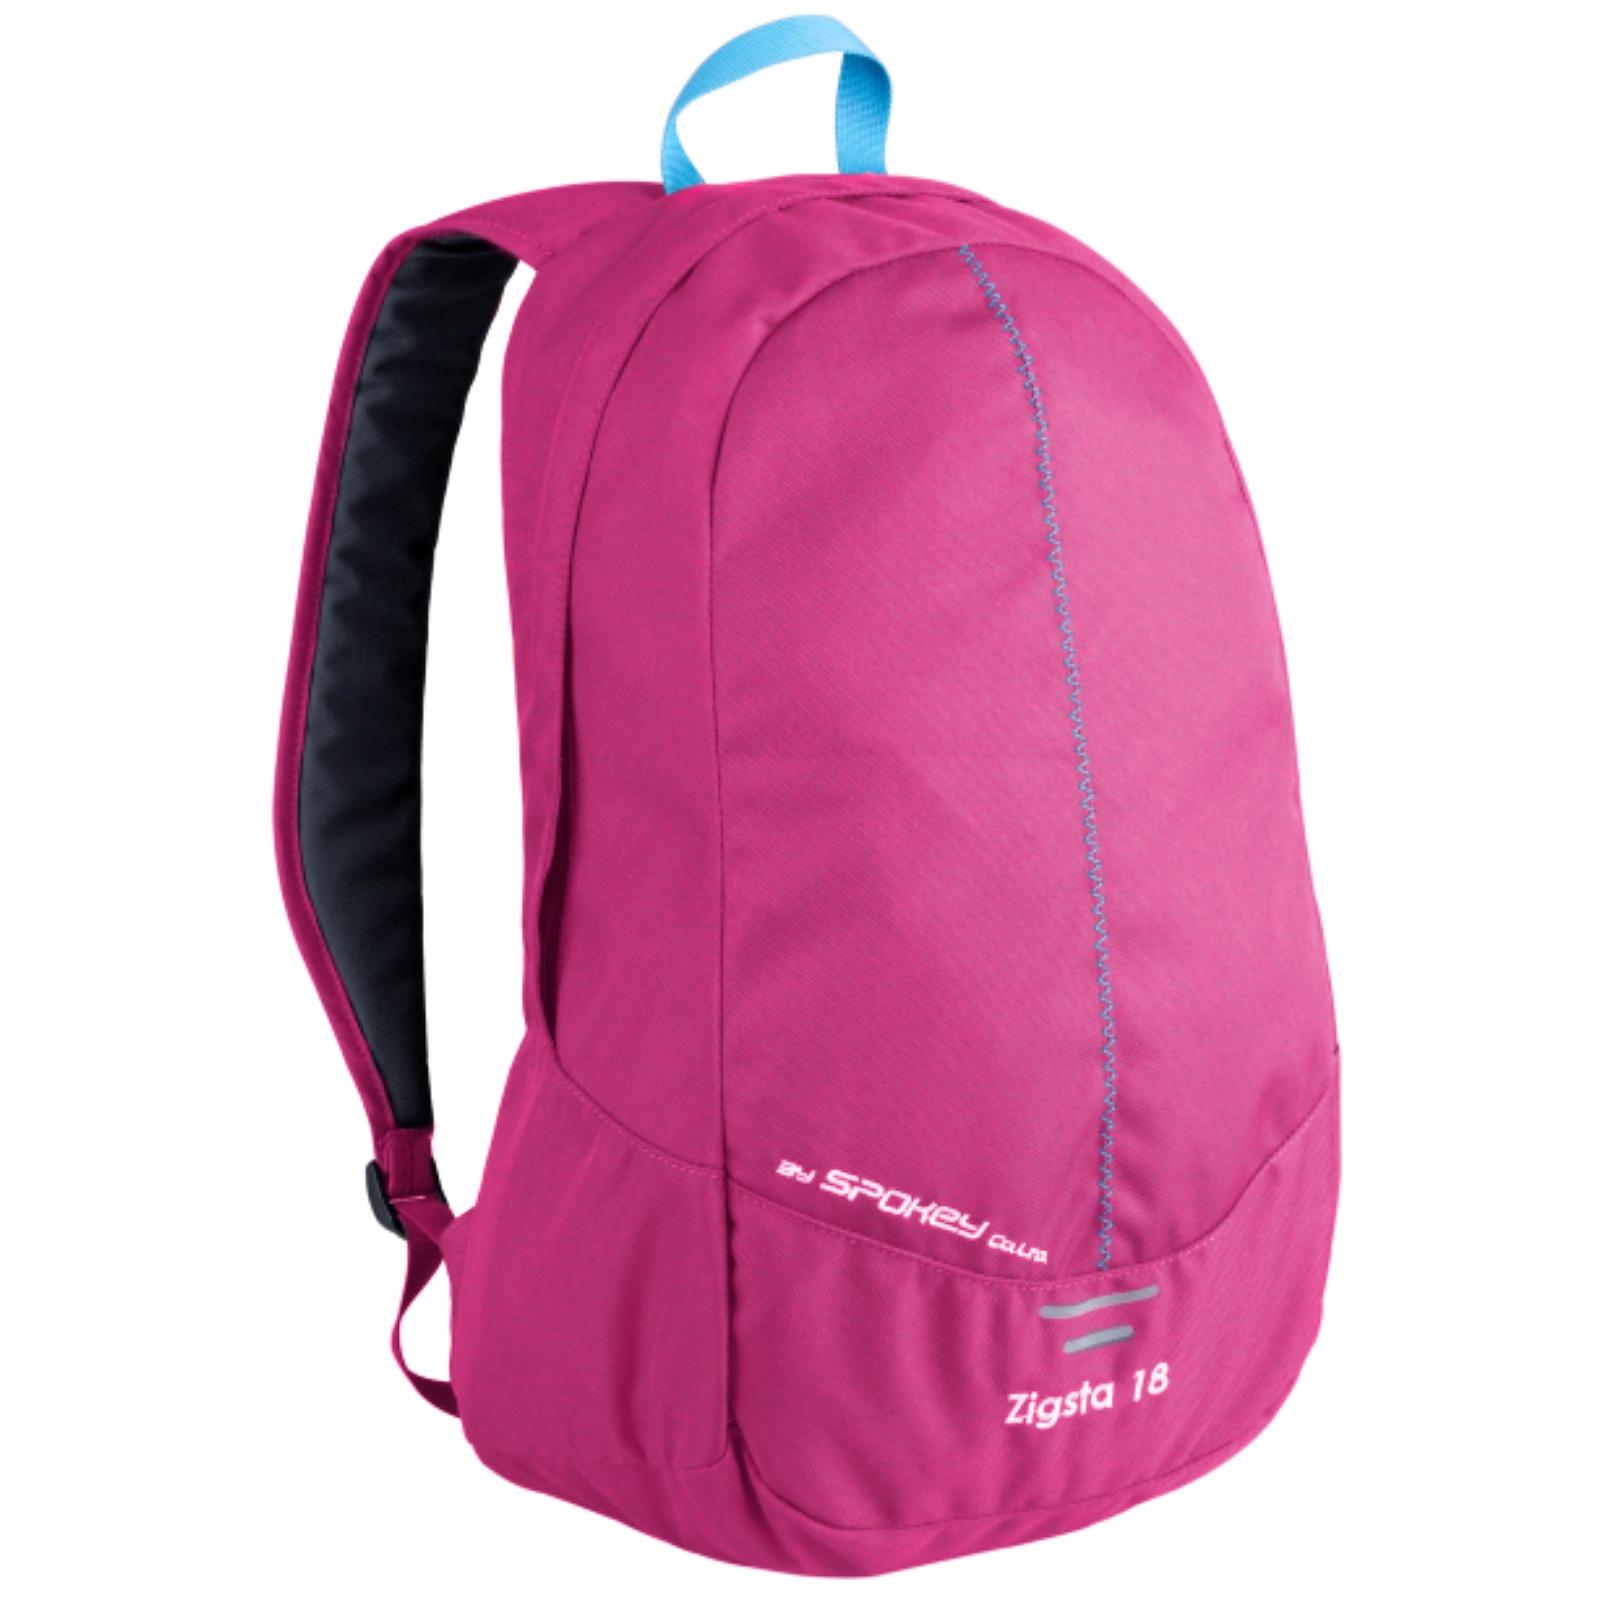 Batoh SPOKEY Zigsta 18L růžový